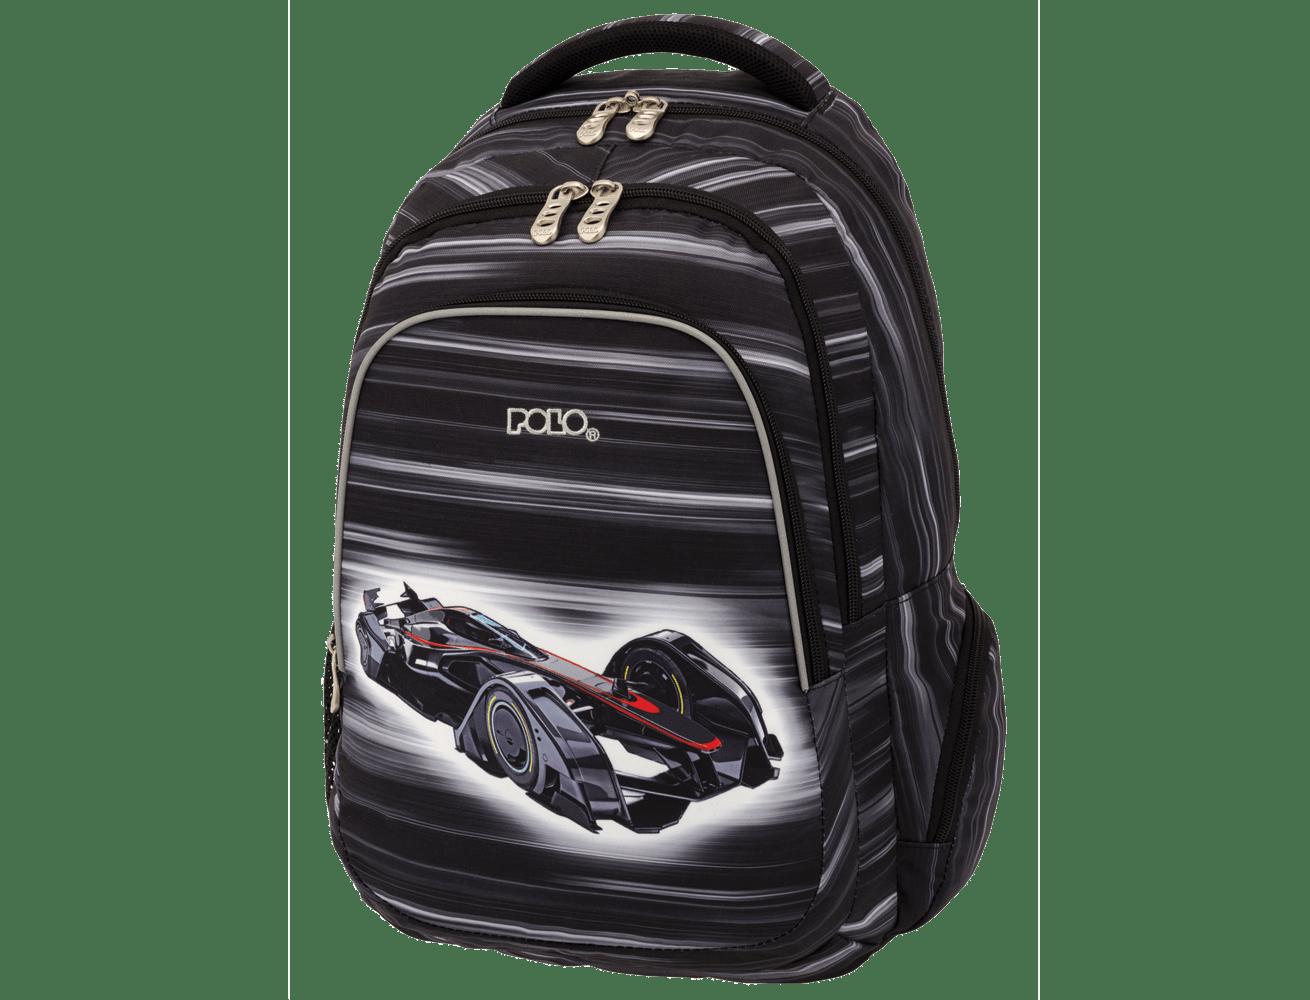 bdeece56b3 Σχολική Τσάντα Polo Racers 9-01-240-02 - Lexicon Shop